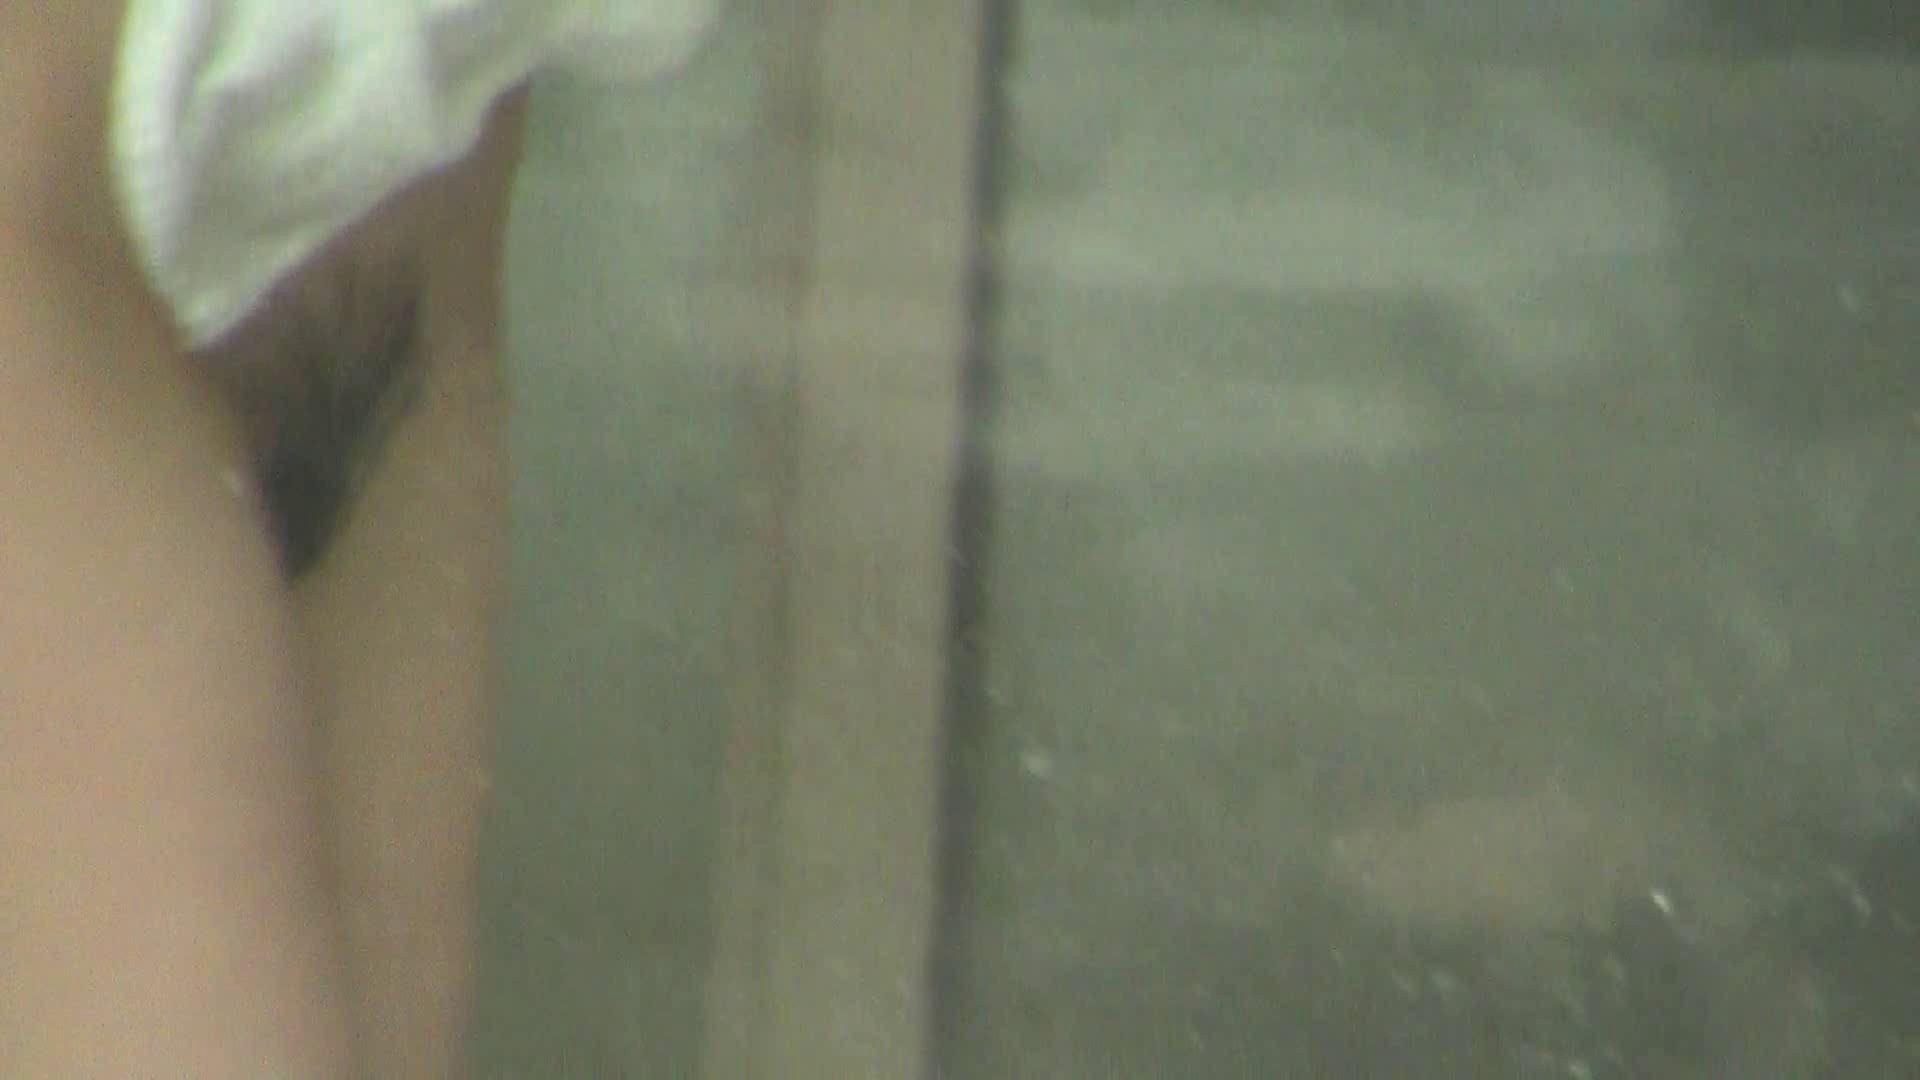 Vol.83 熟しても以前可愛らしさ保つ美年増 OLのボディ のぞき動画画像 62PIX 56